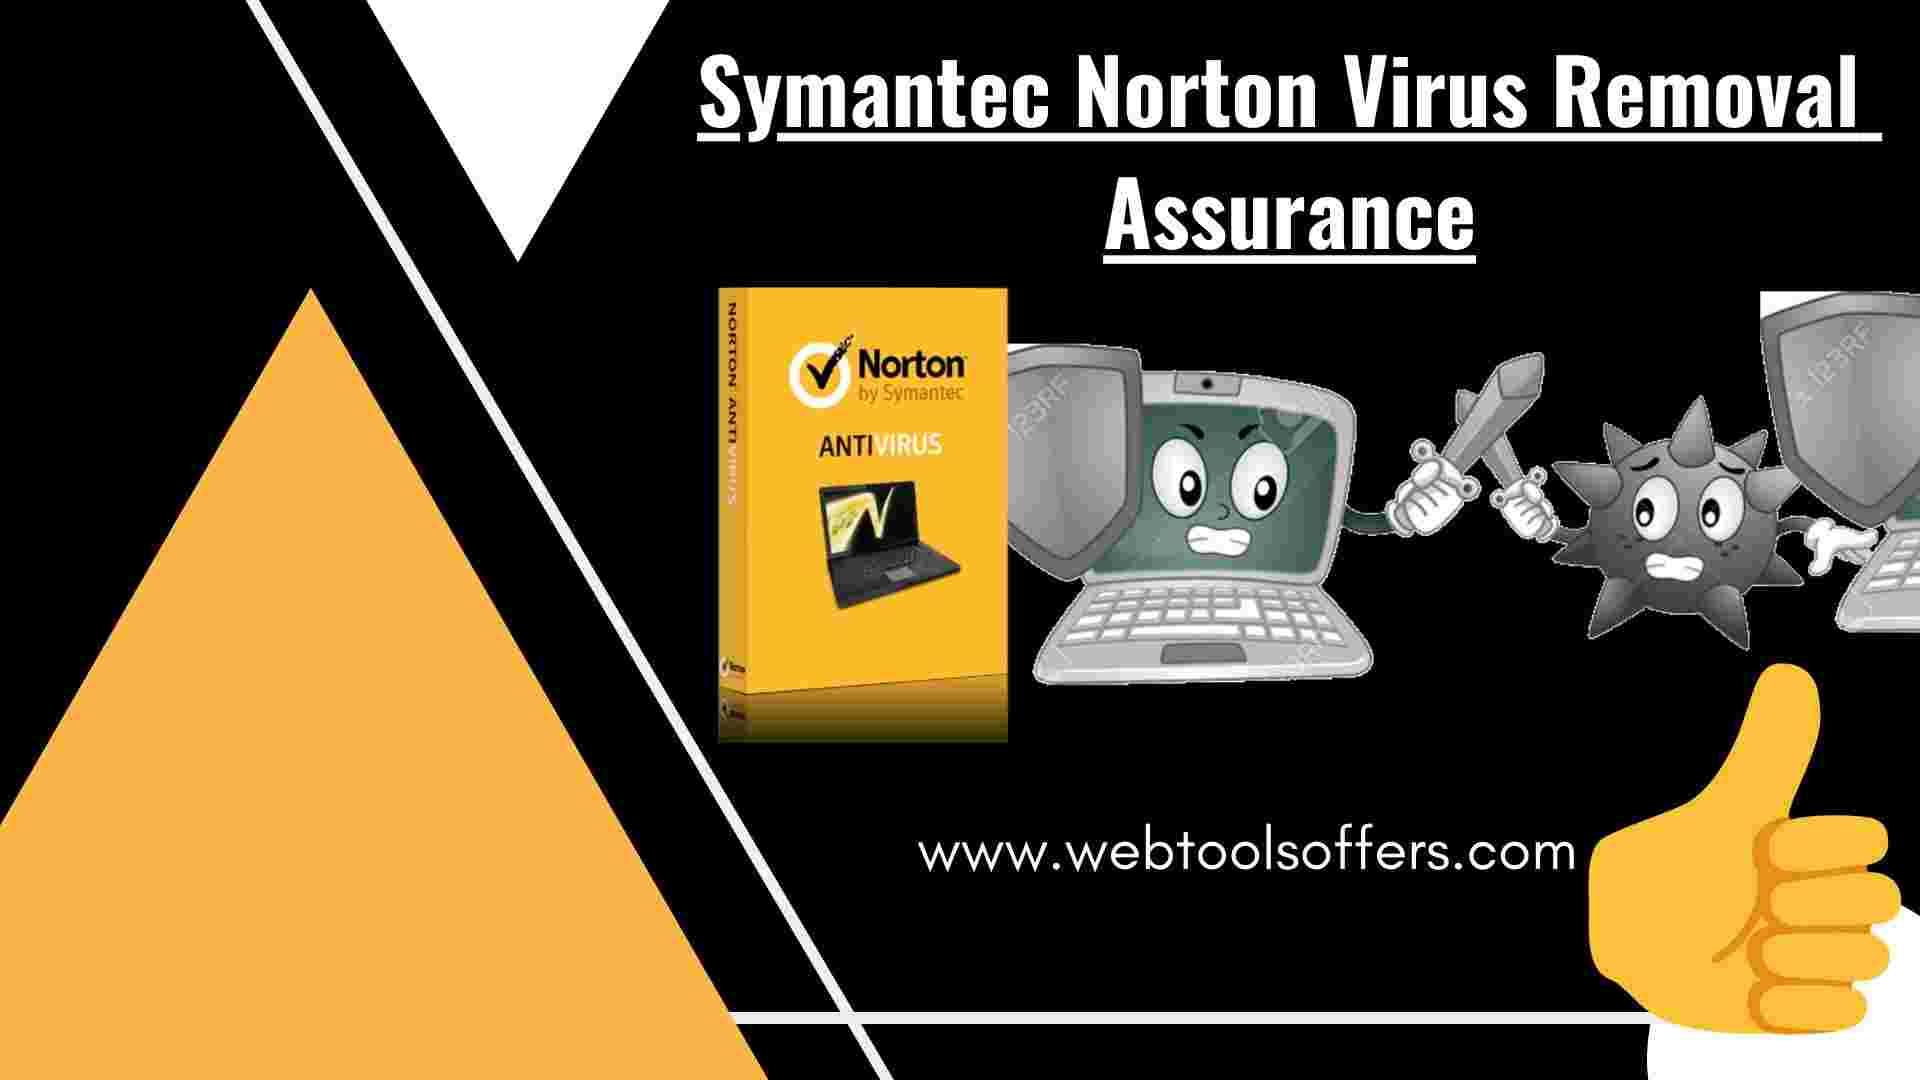 Norton Virus Removal Assurance